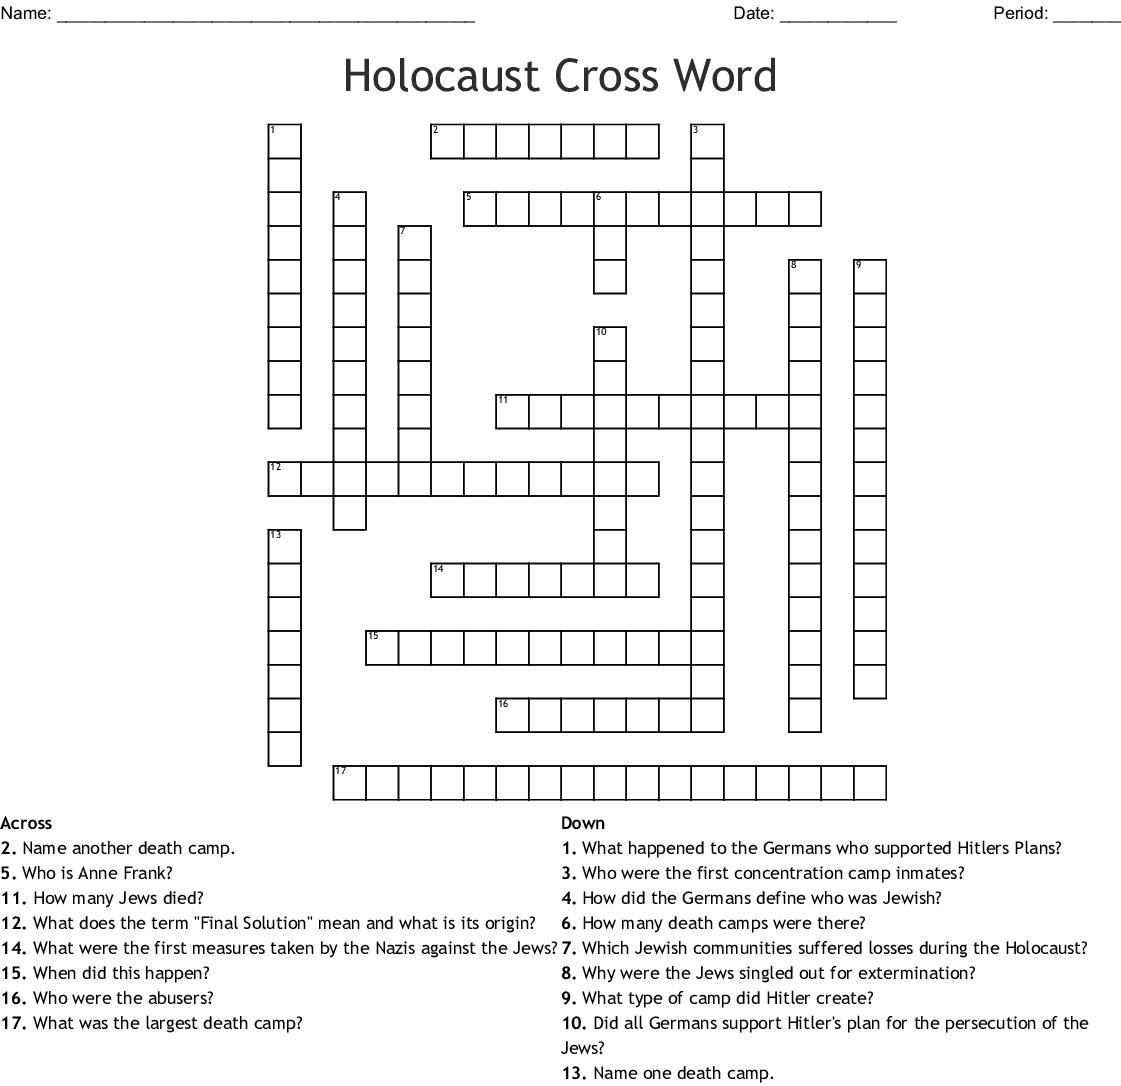 Holocaust Cross Word